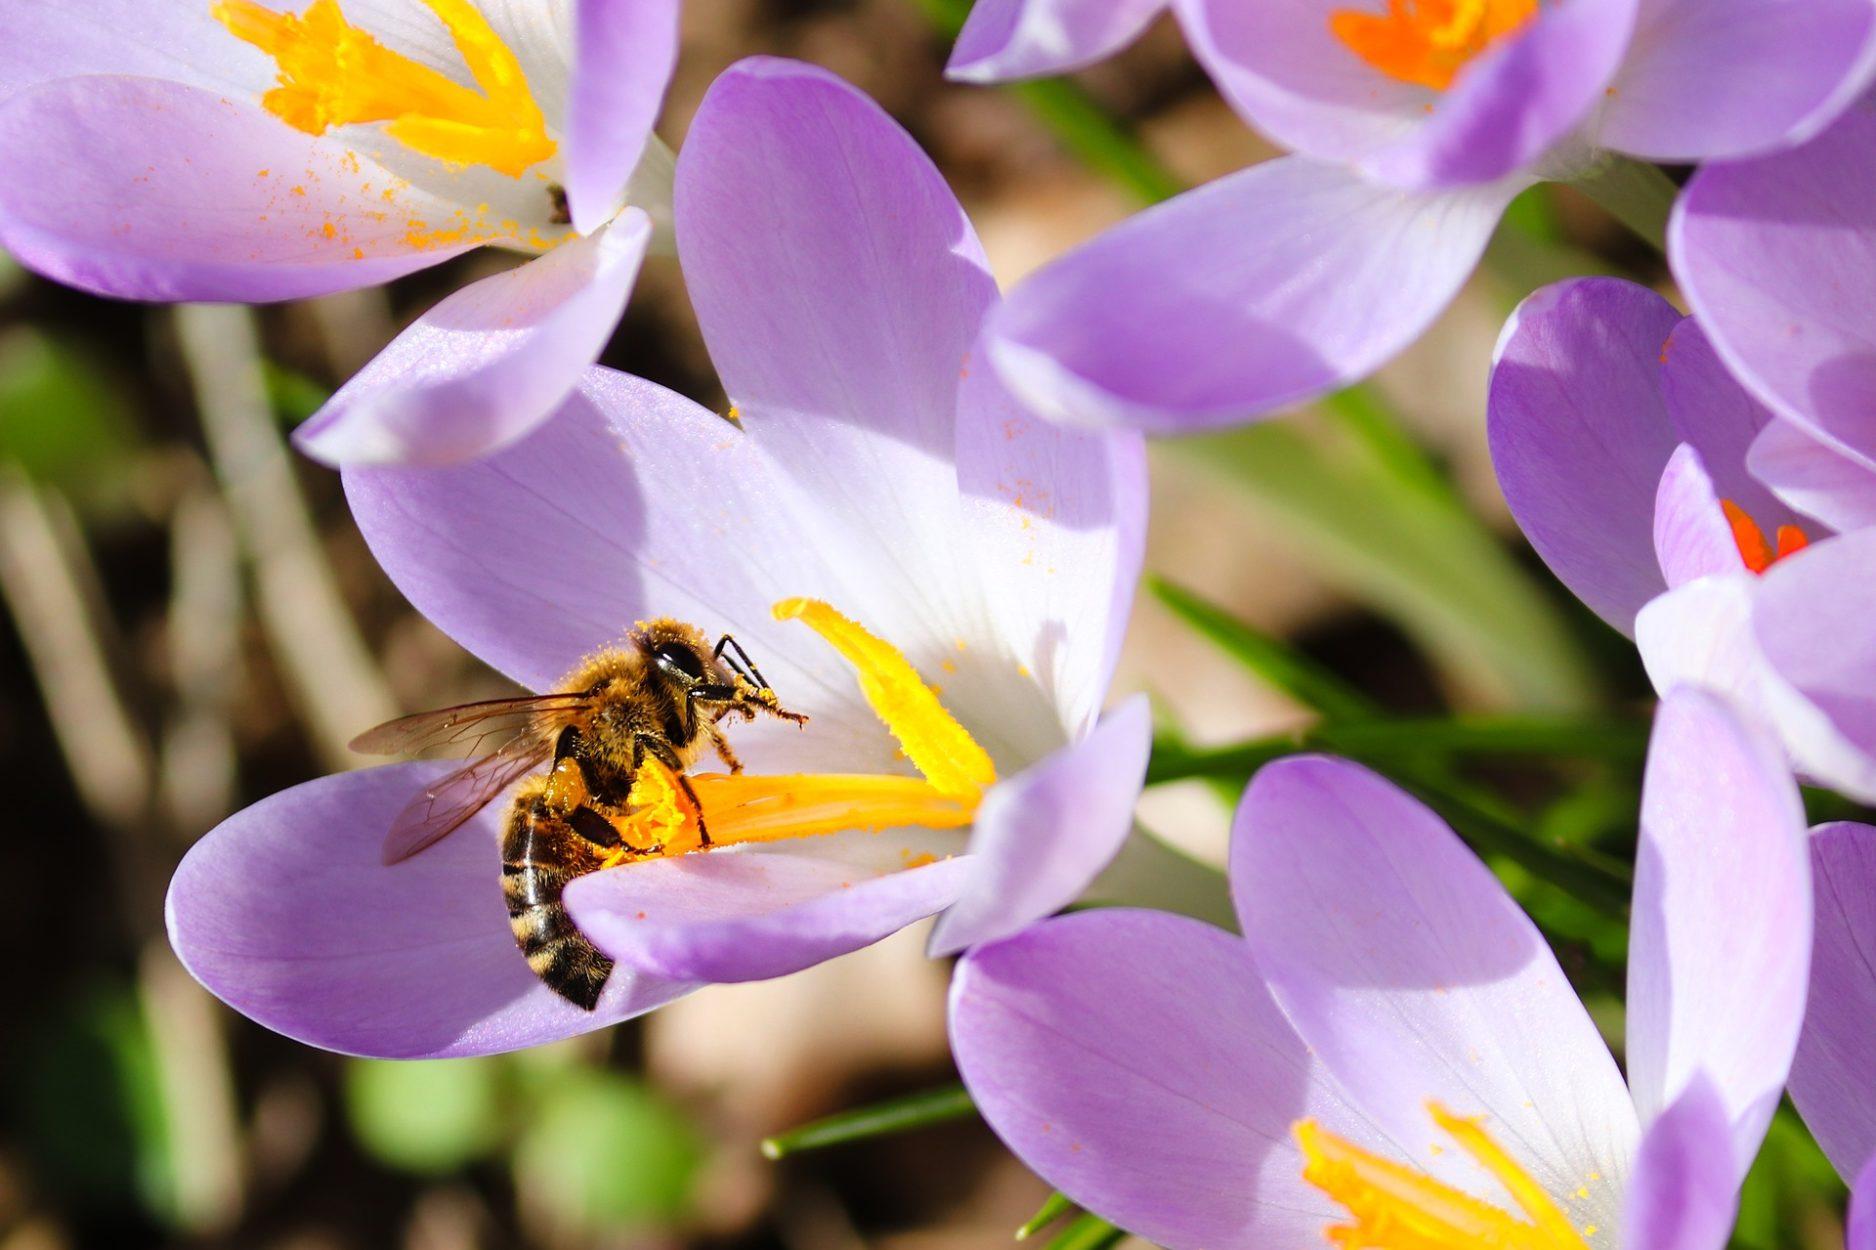 04.11.2019 - Vortrag: Bienen verstehen - Bienen unterstützen